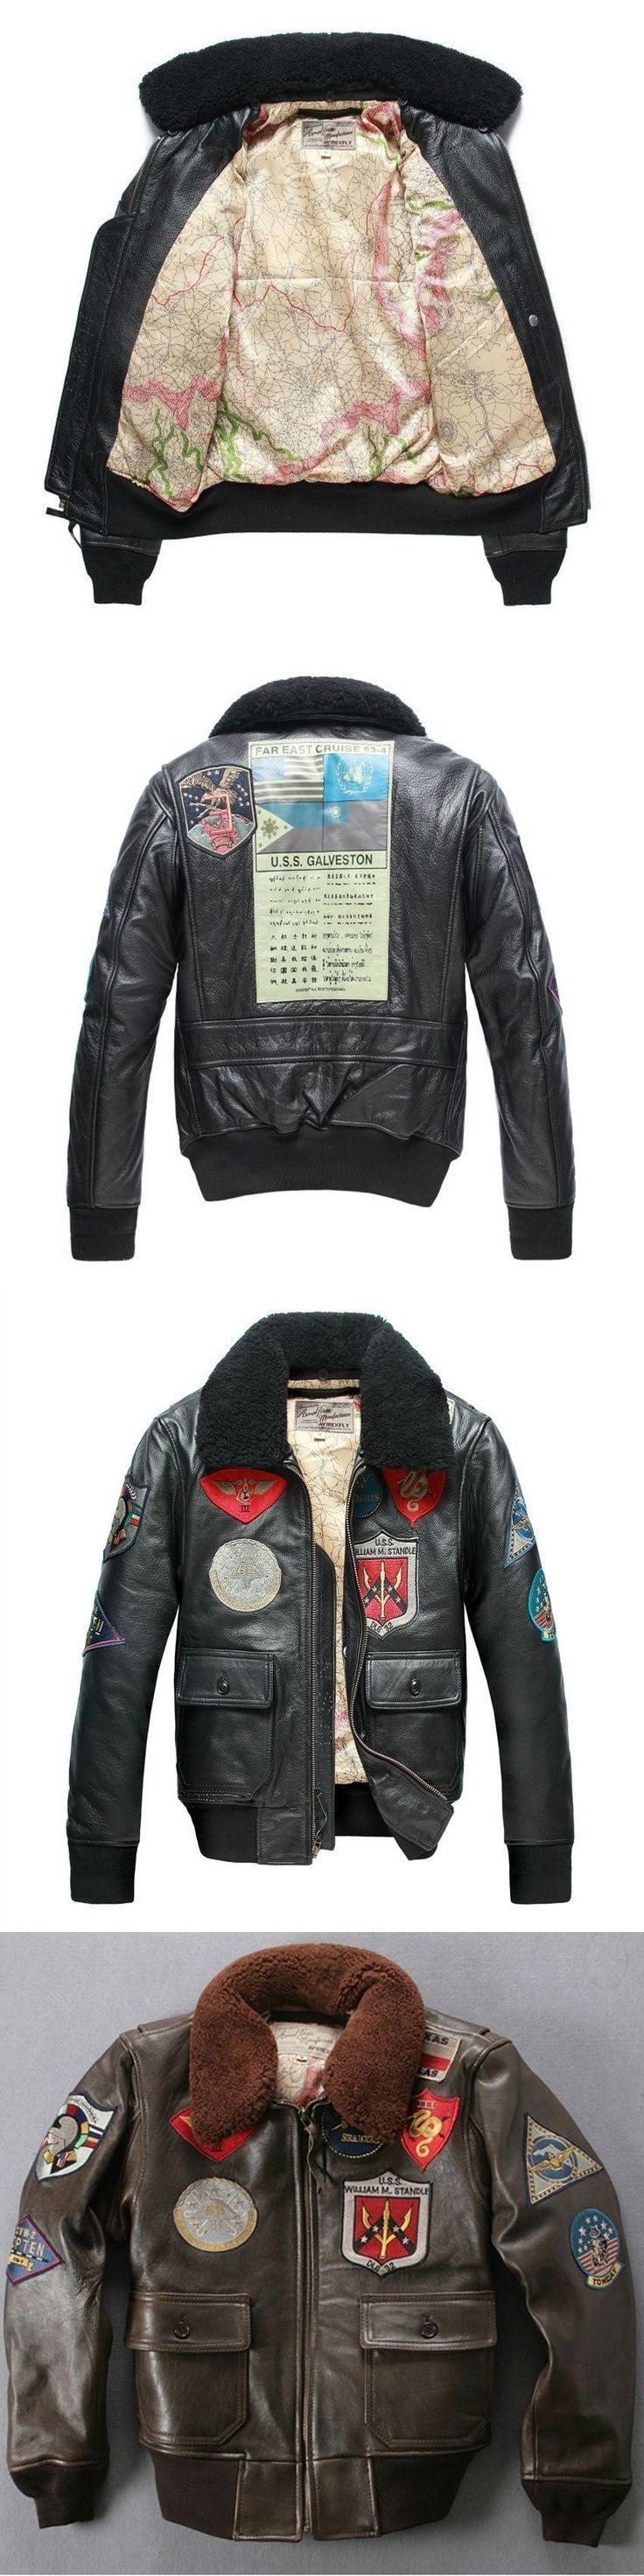 Avirex fly fur collar genuine leather jacket men brown thick sheepskin flight jacket black men's winter leather coat pilot suit #MensFashionRock